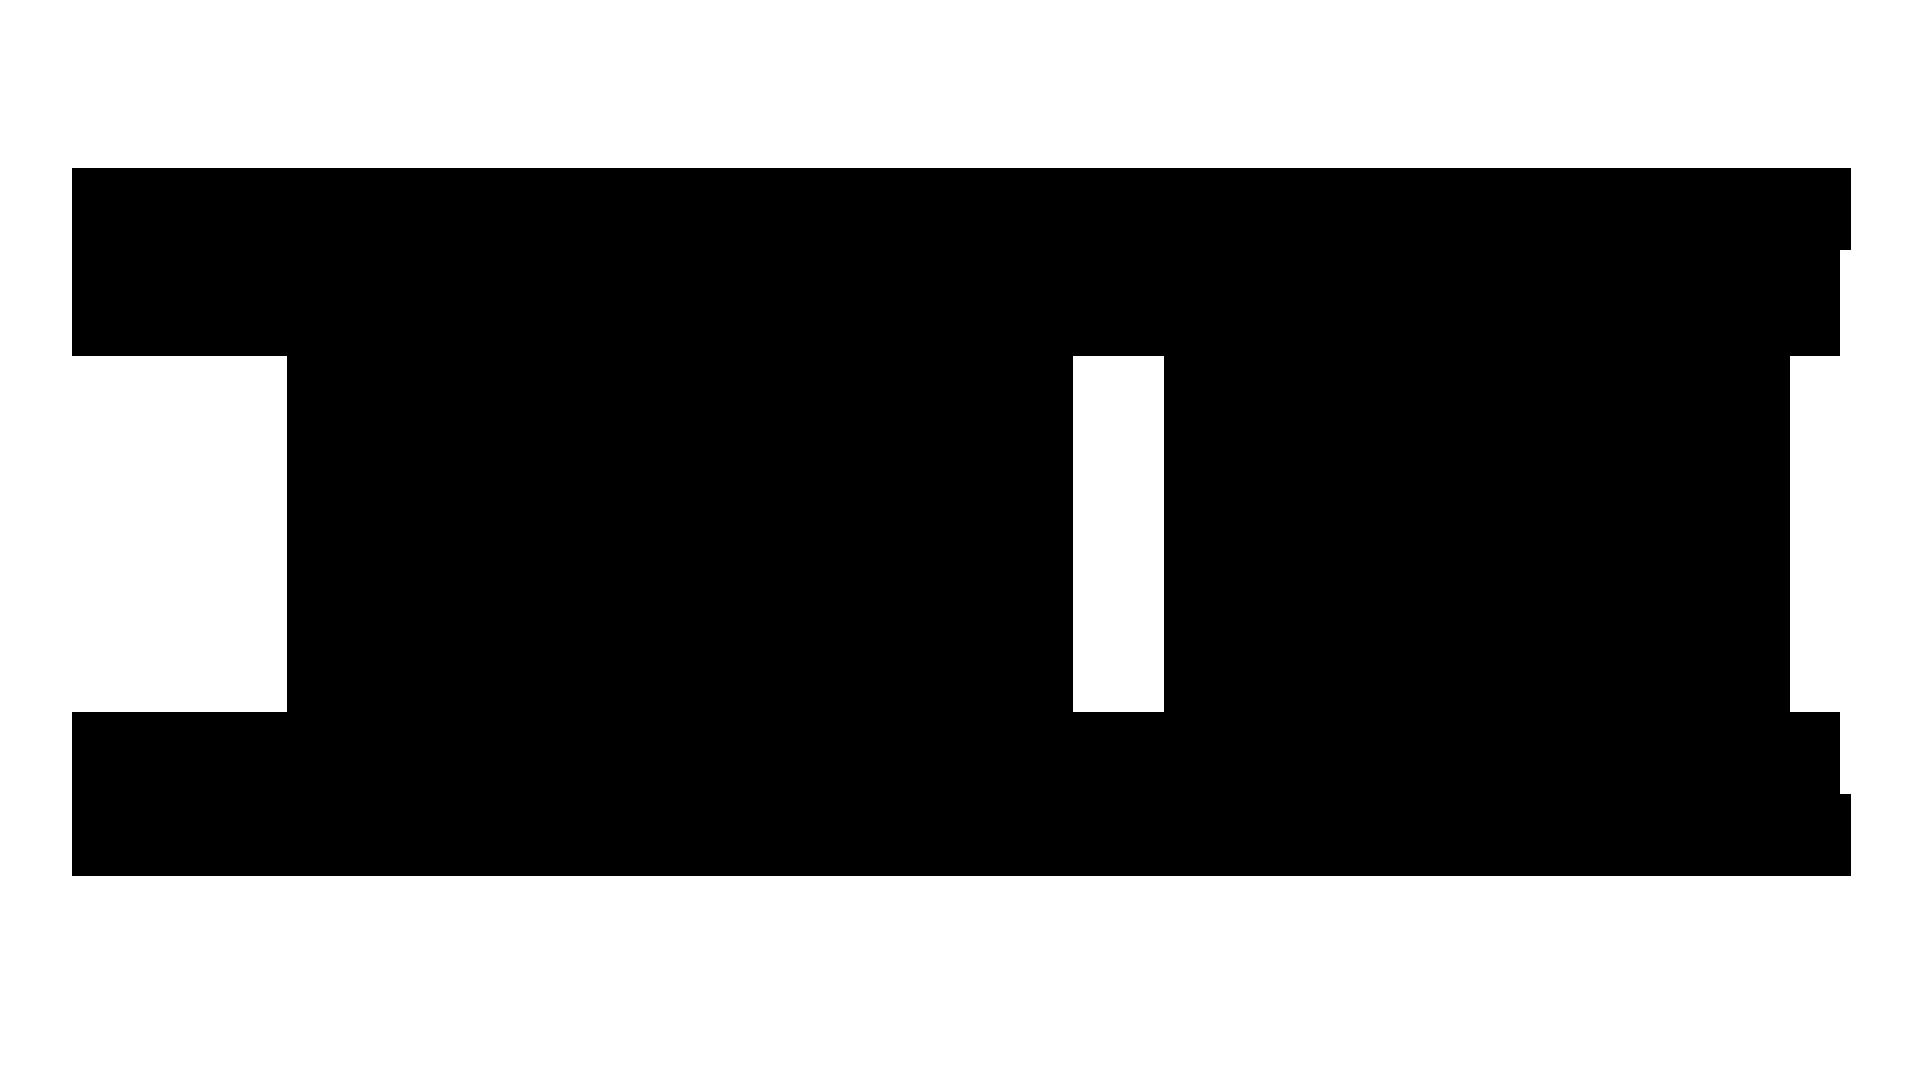 THX Logo, THX Symbol, Meaning, History and Evolution